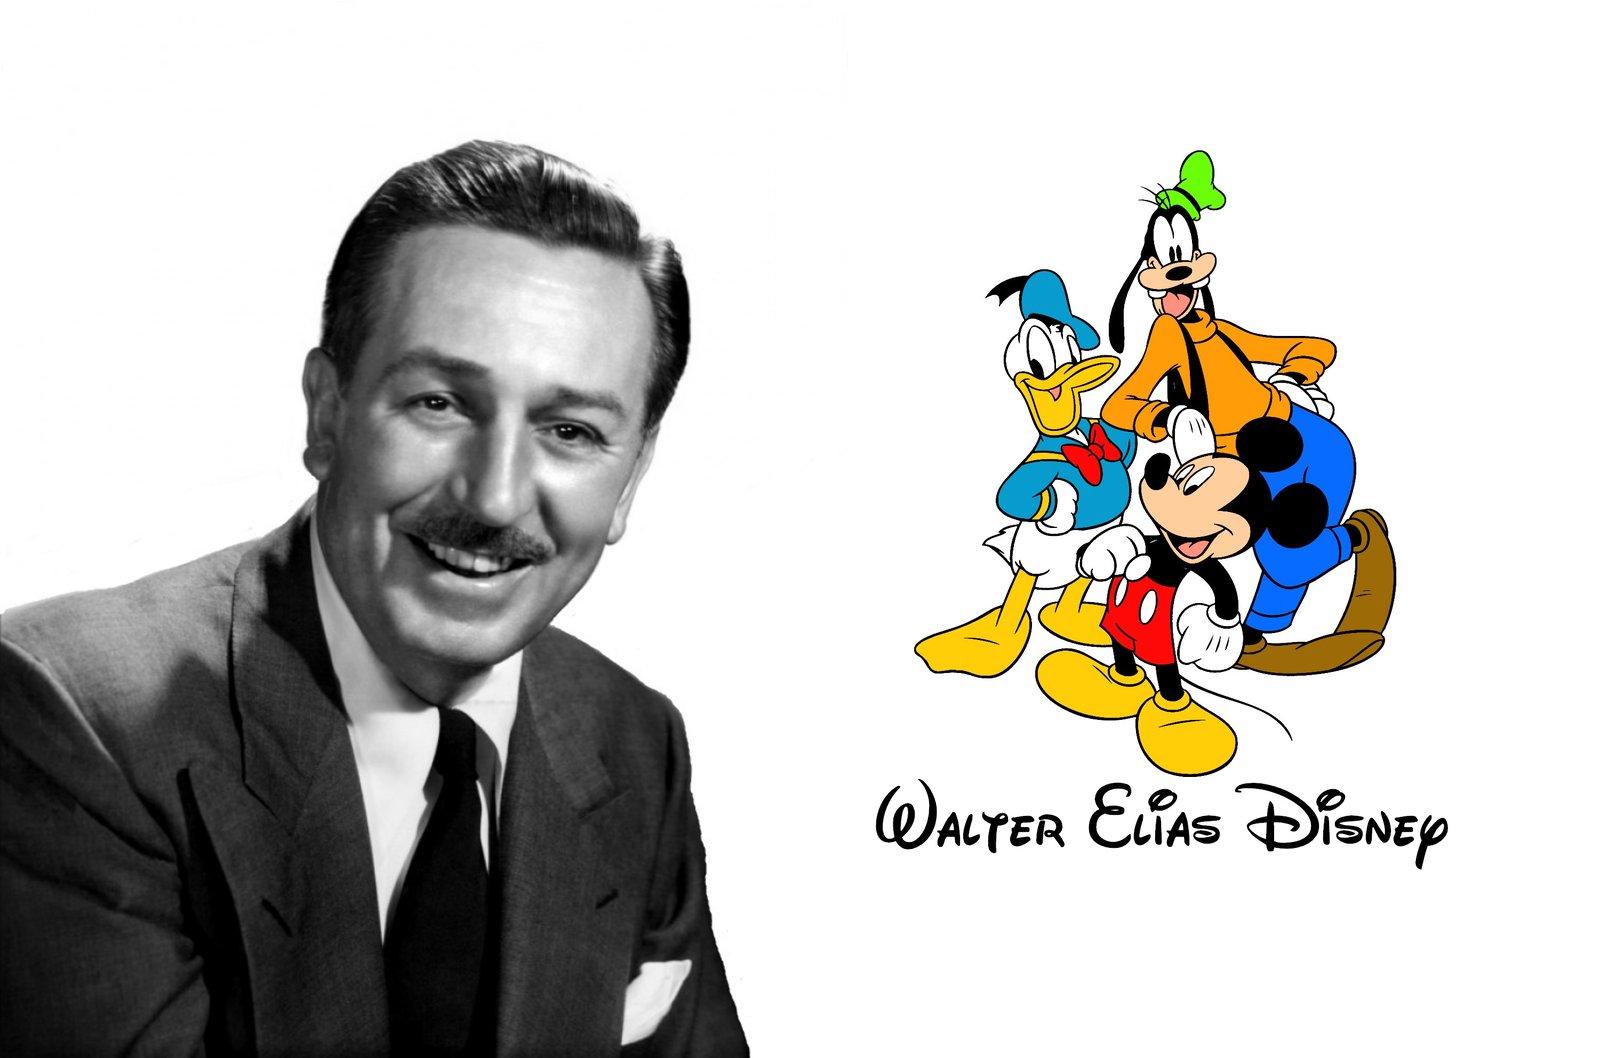 Walt Disney Wallpaper PC Windows 9589 Wallpaper 1600x1058